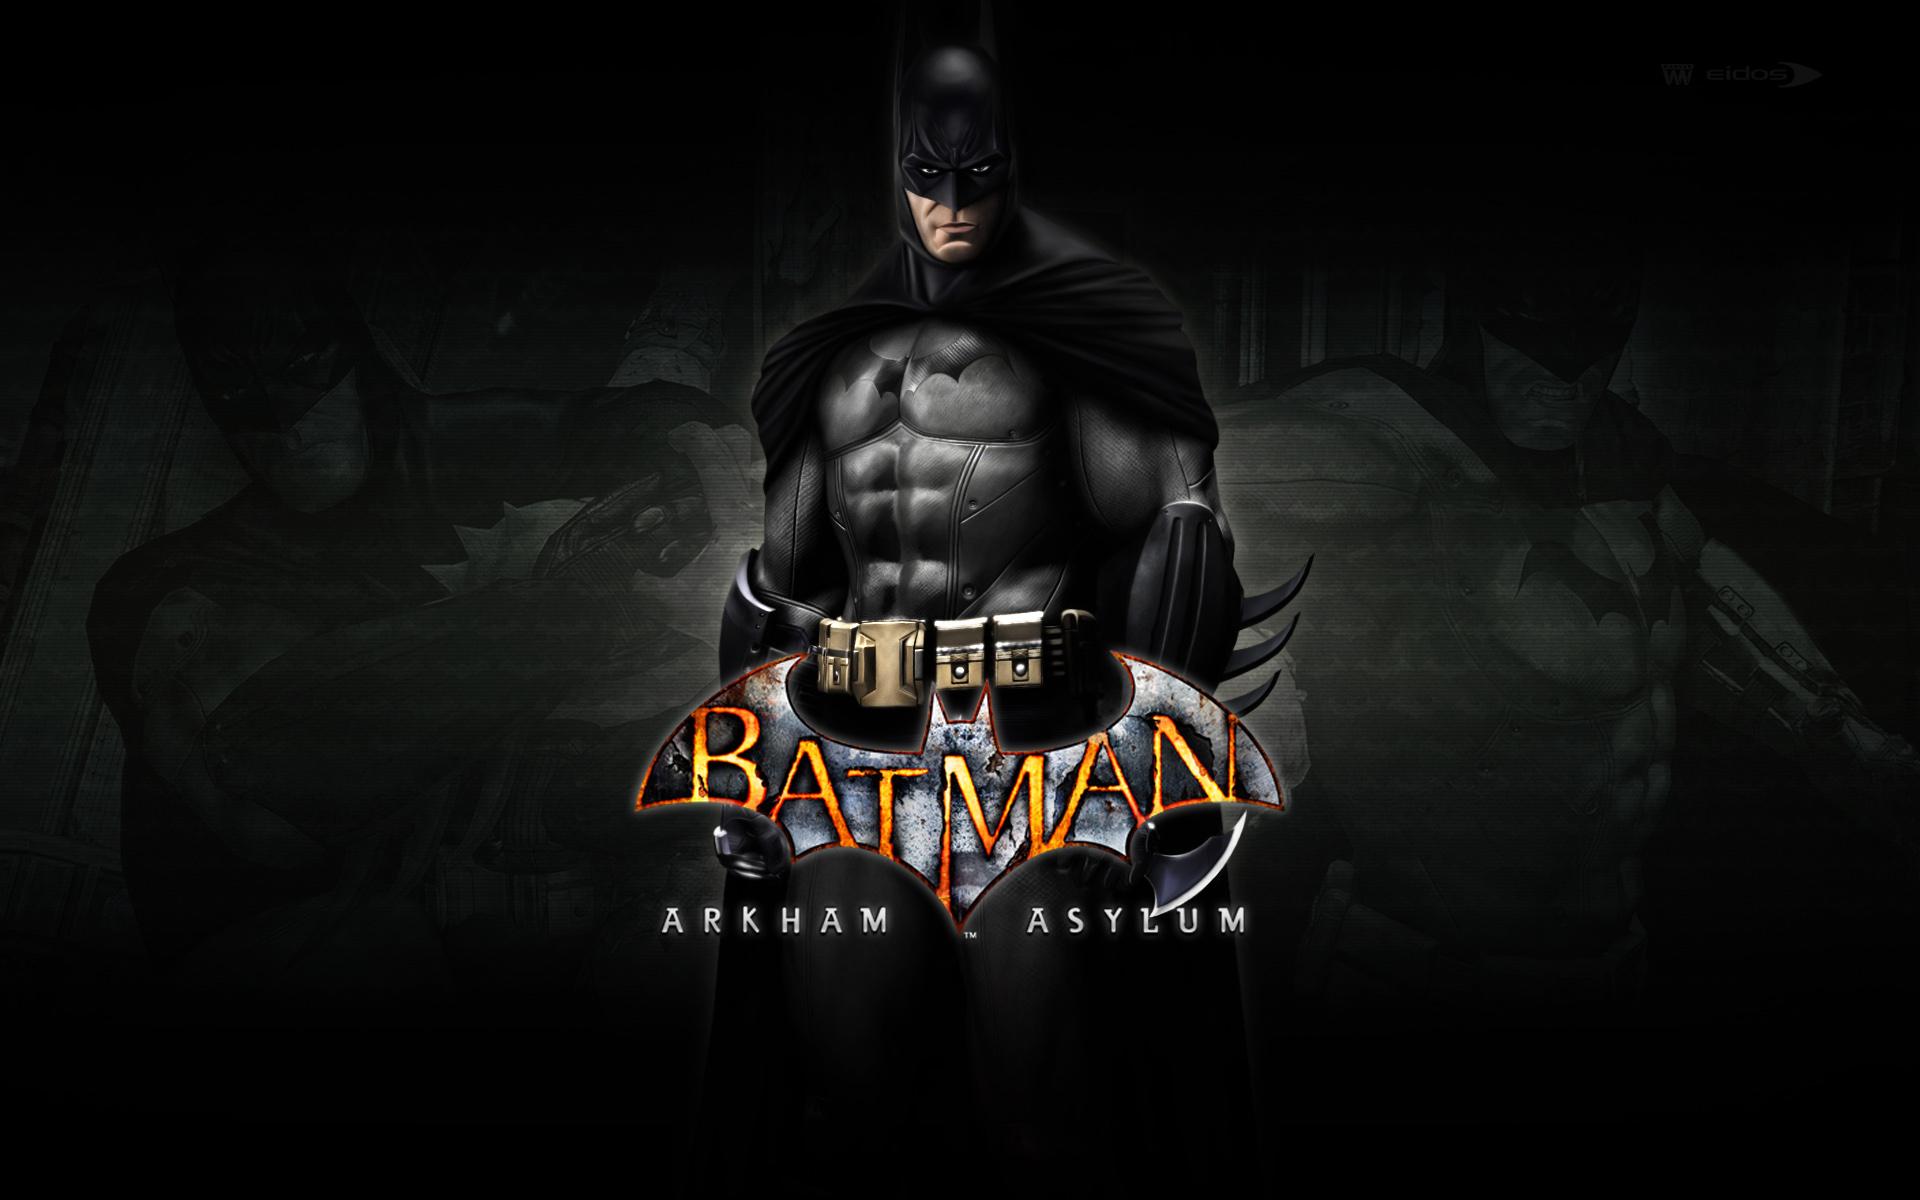 Batman Arkham Asylum Wallpaper Batman wallpaper   189147 1920x1200